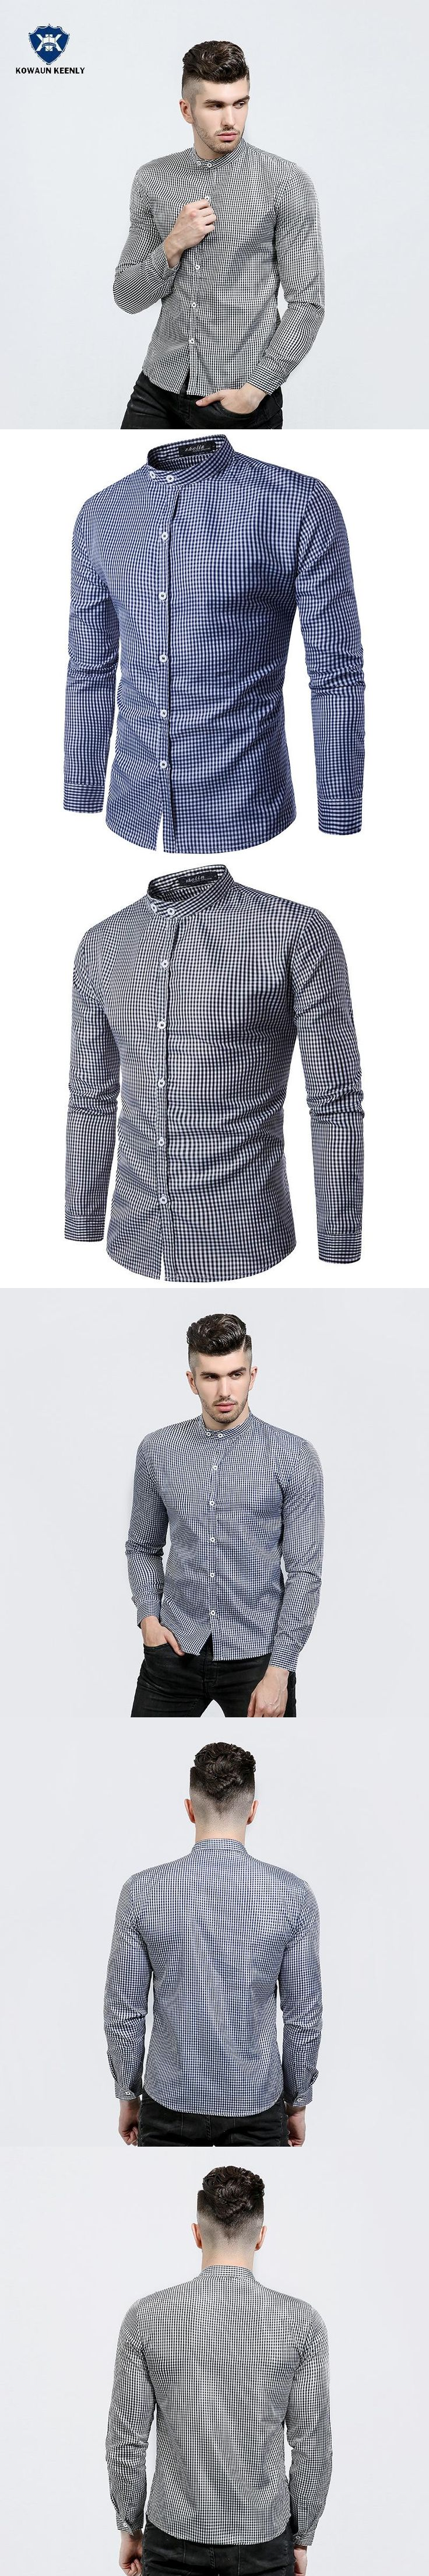 2017 Autumn Fashion Navy Blue Plaid Shirt Male Long Sleeve Black Stand Collar Shirt Party Luxury Slim Fit Casual Shirts Men